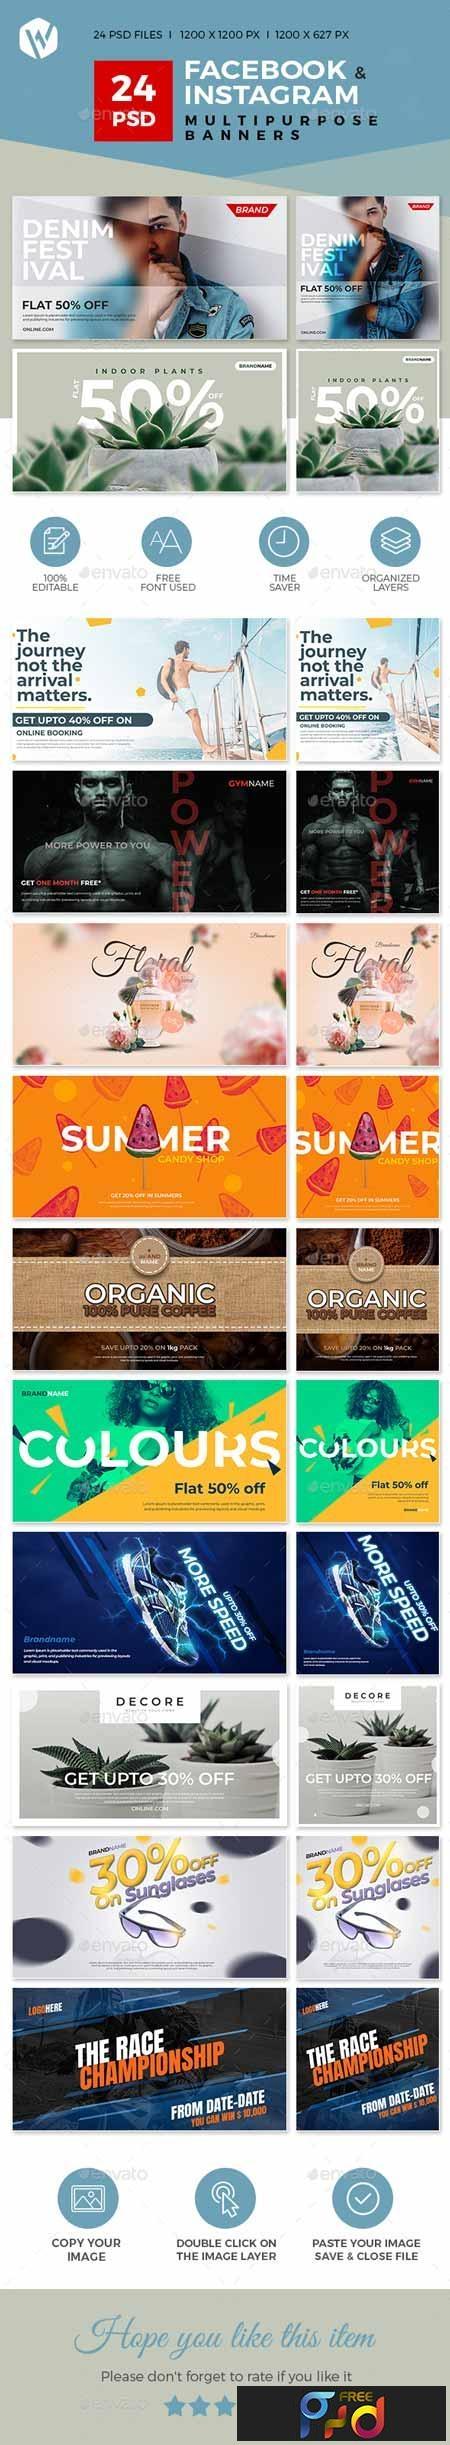 24 Facebook & Instagram Multipurpose Banners 23237608 1